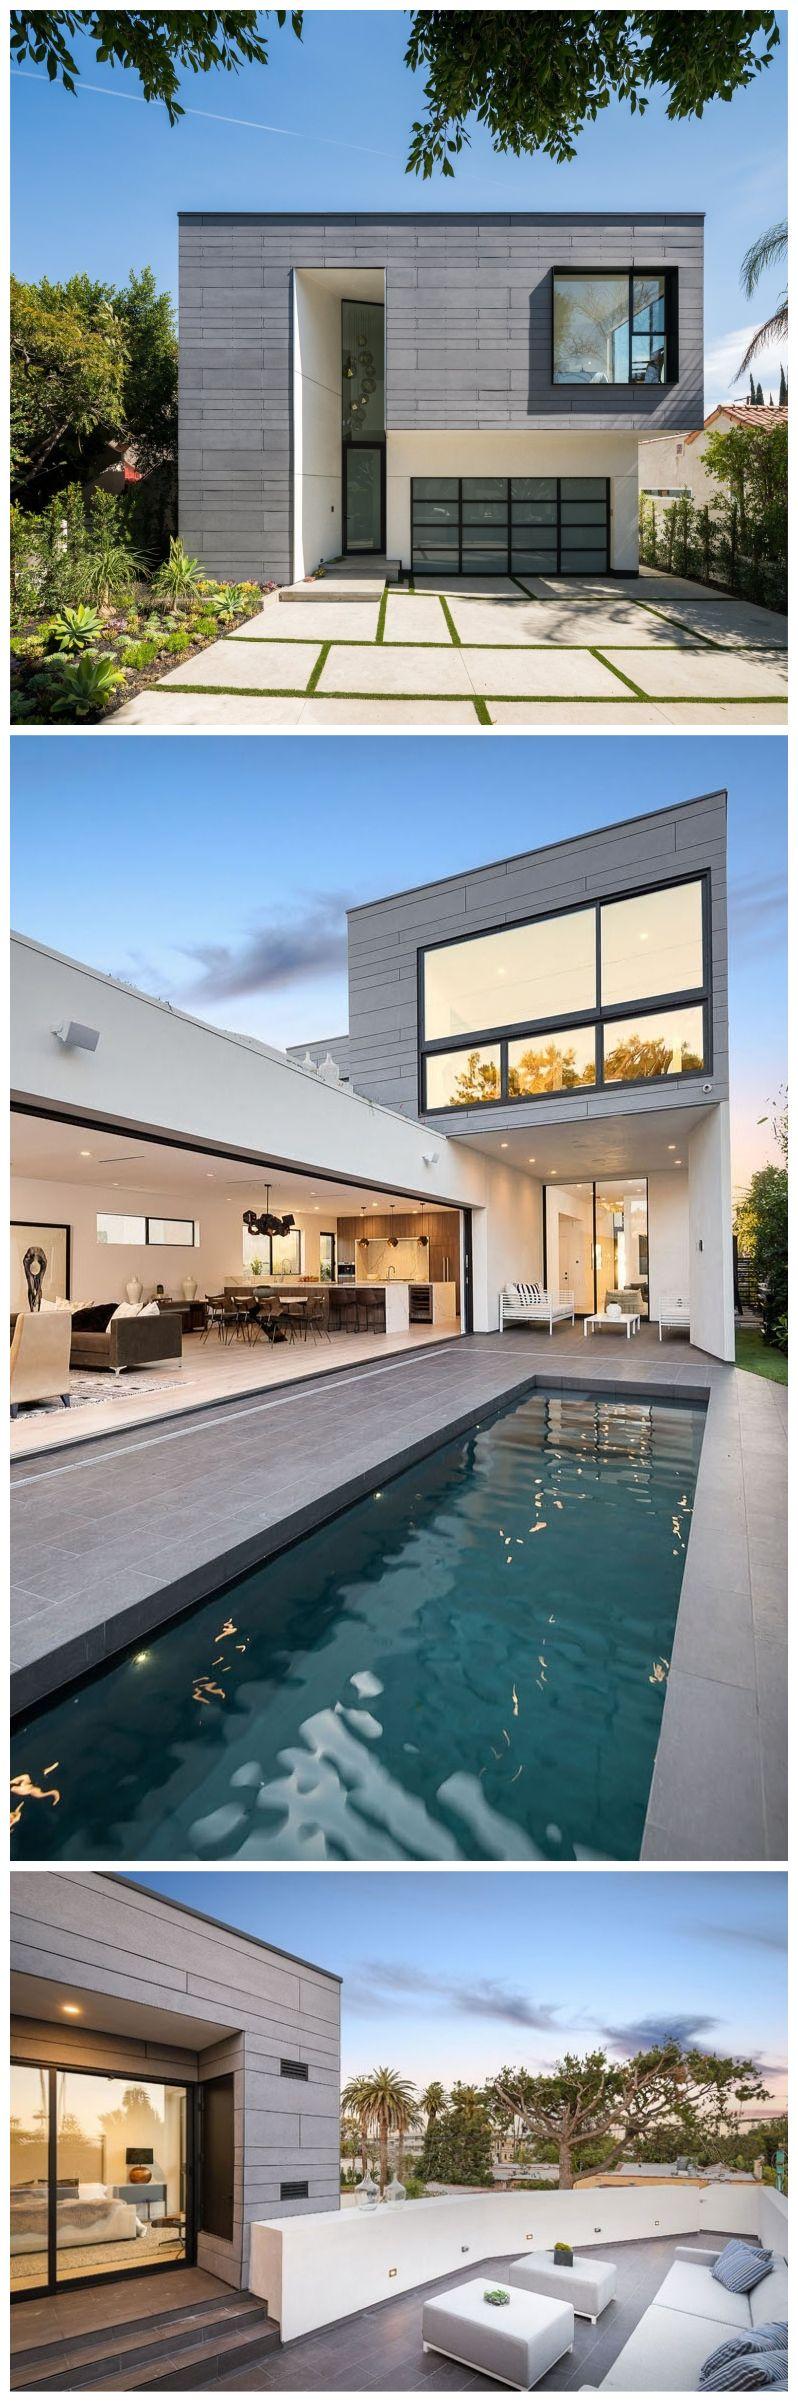 Backyard pros pool  patio jasper al also equitone facade equitonefacade on pinterest rh